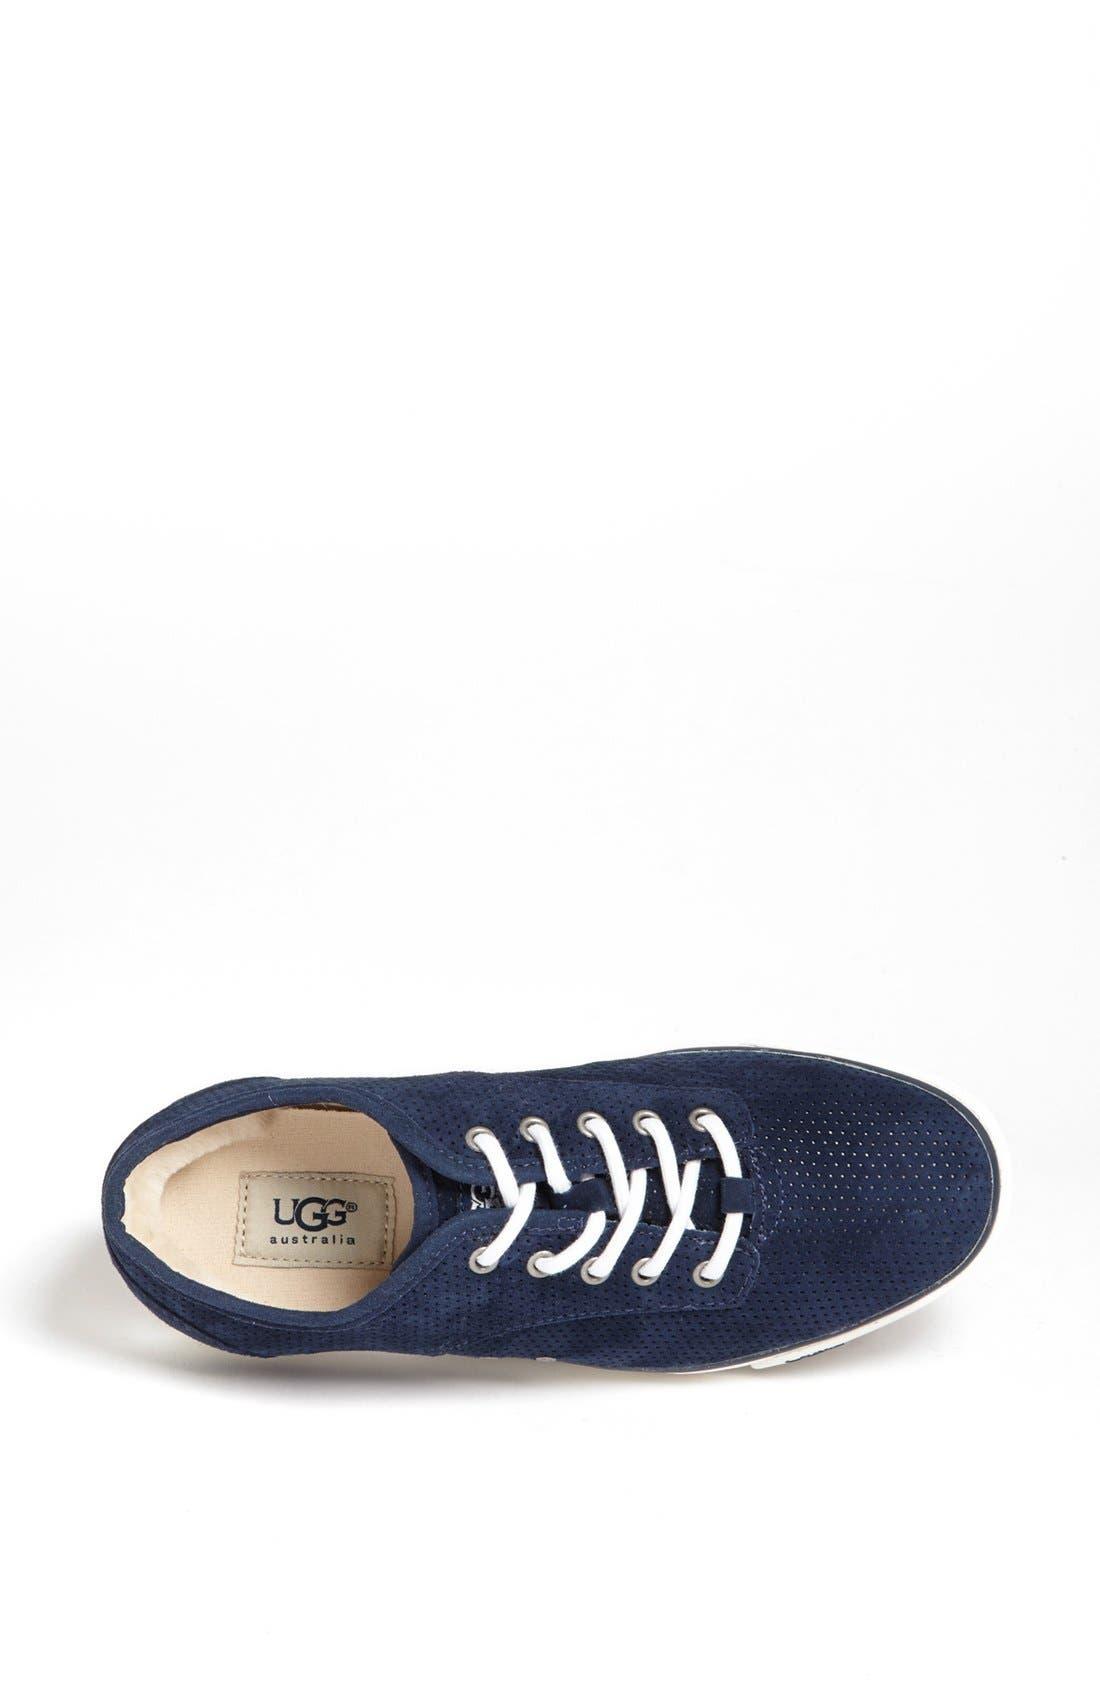 Alternate Image 3  - UGG® Australia 'Hally' Perforated Suede Sneaker